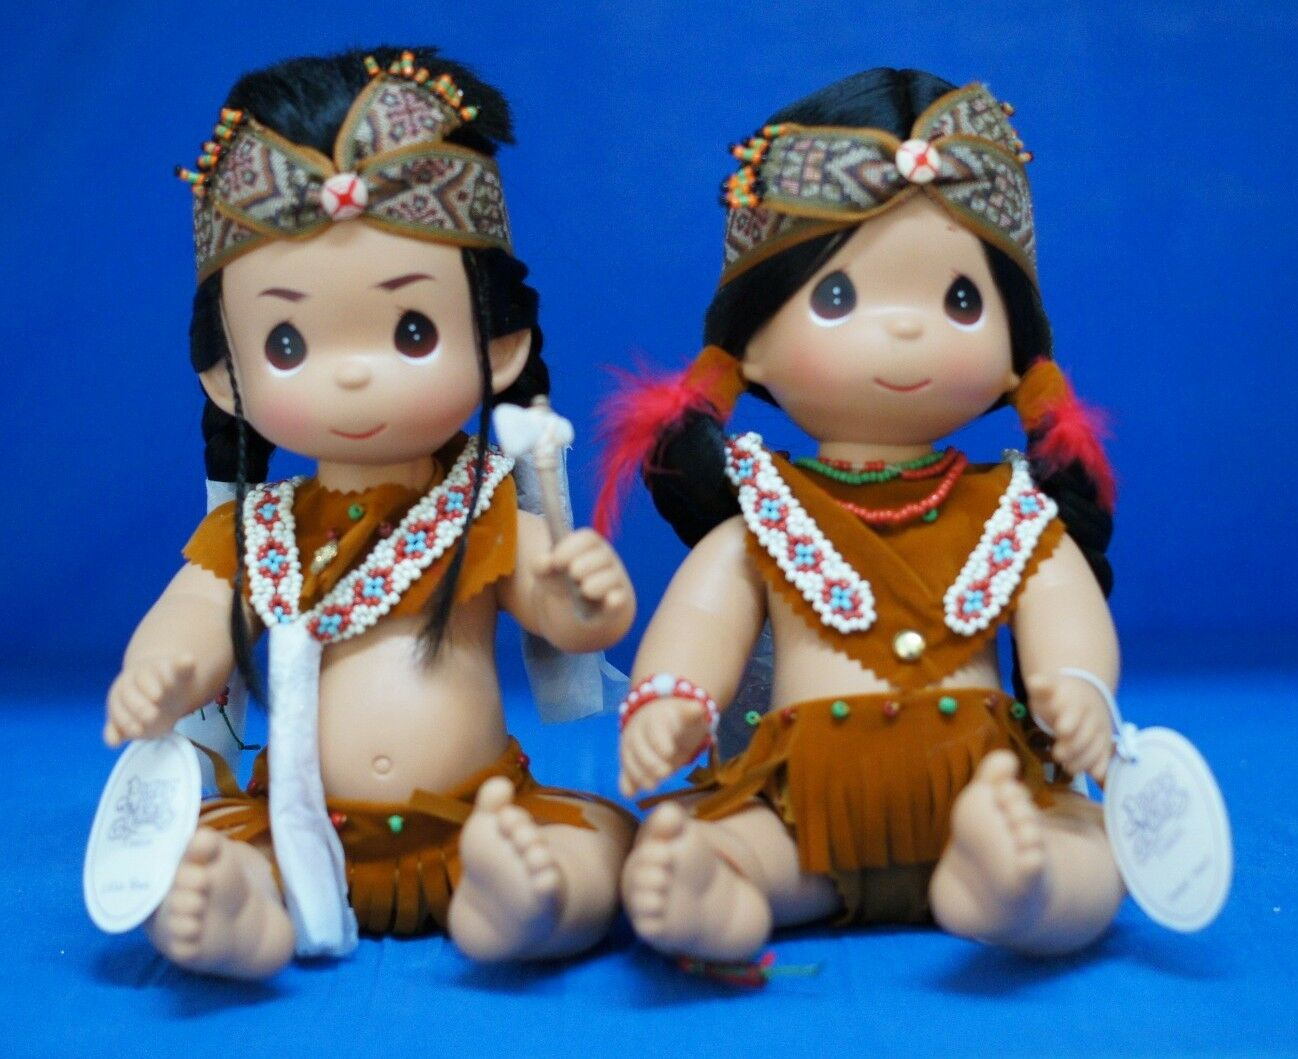 Little Valiente & tender heart 12  juego de muñeca preciosos momentos 4428 4429 Firmado